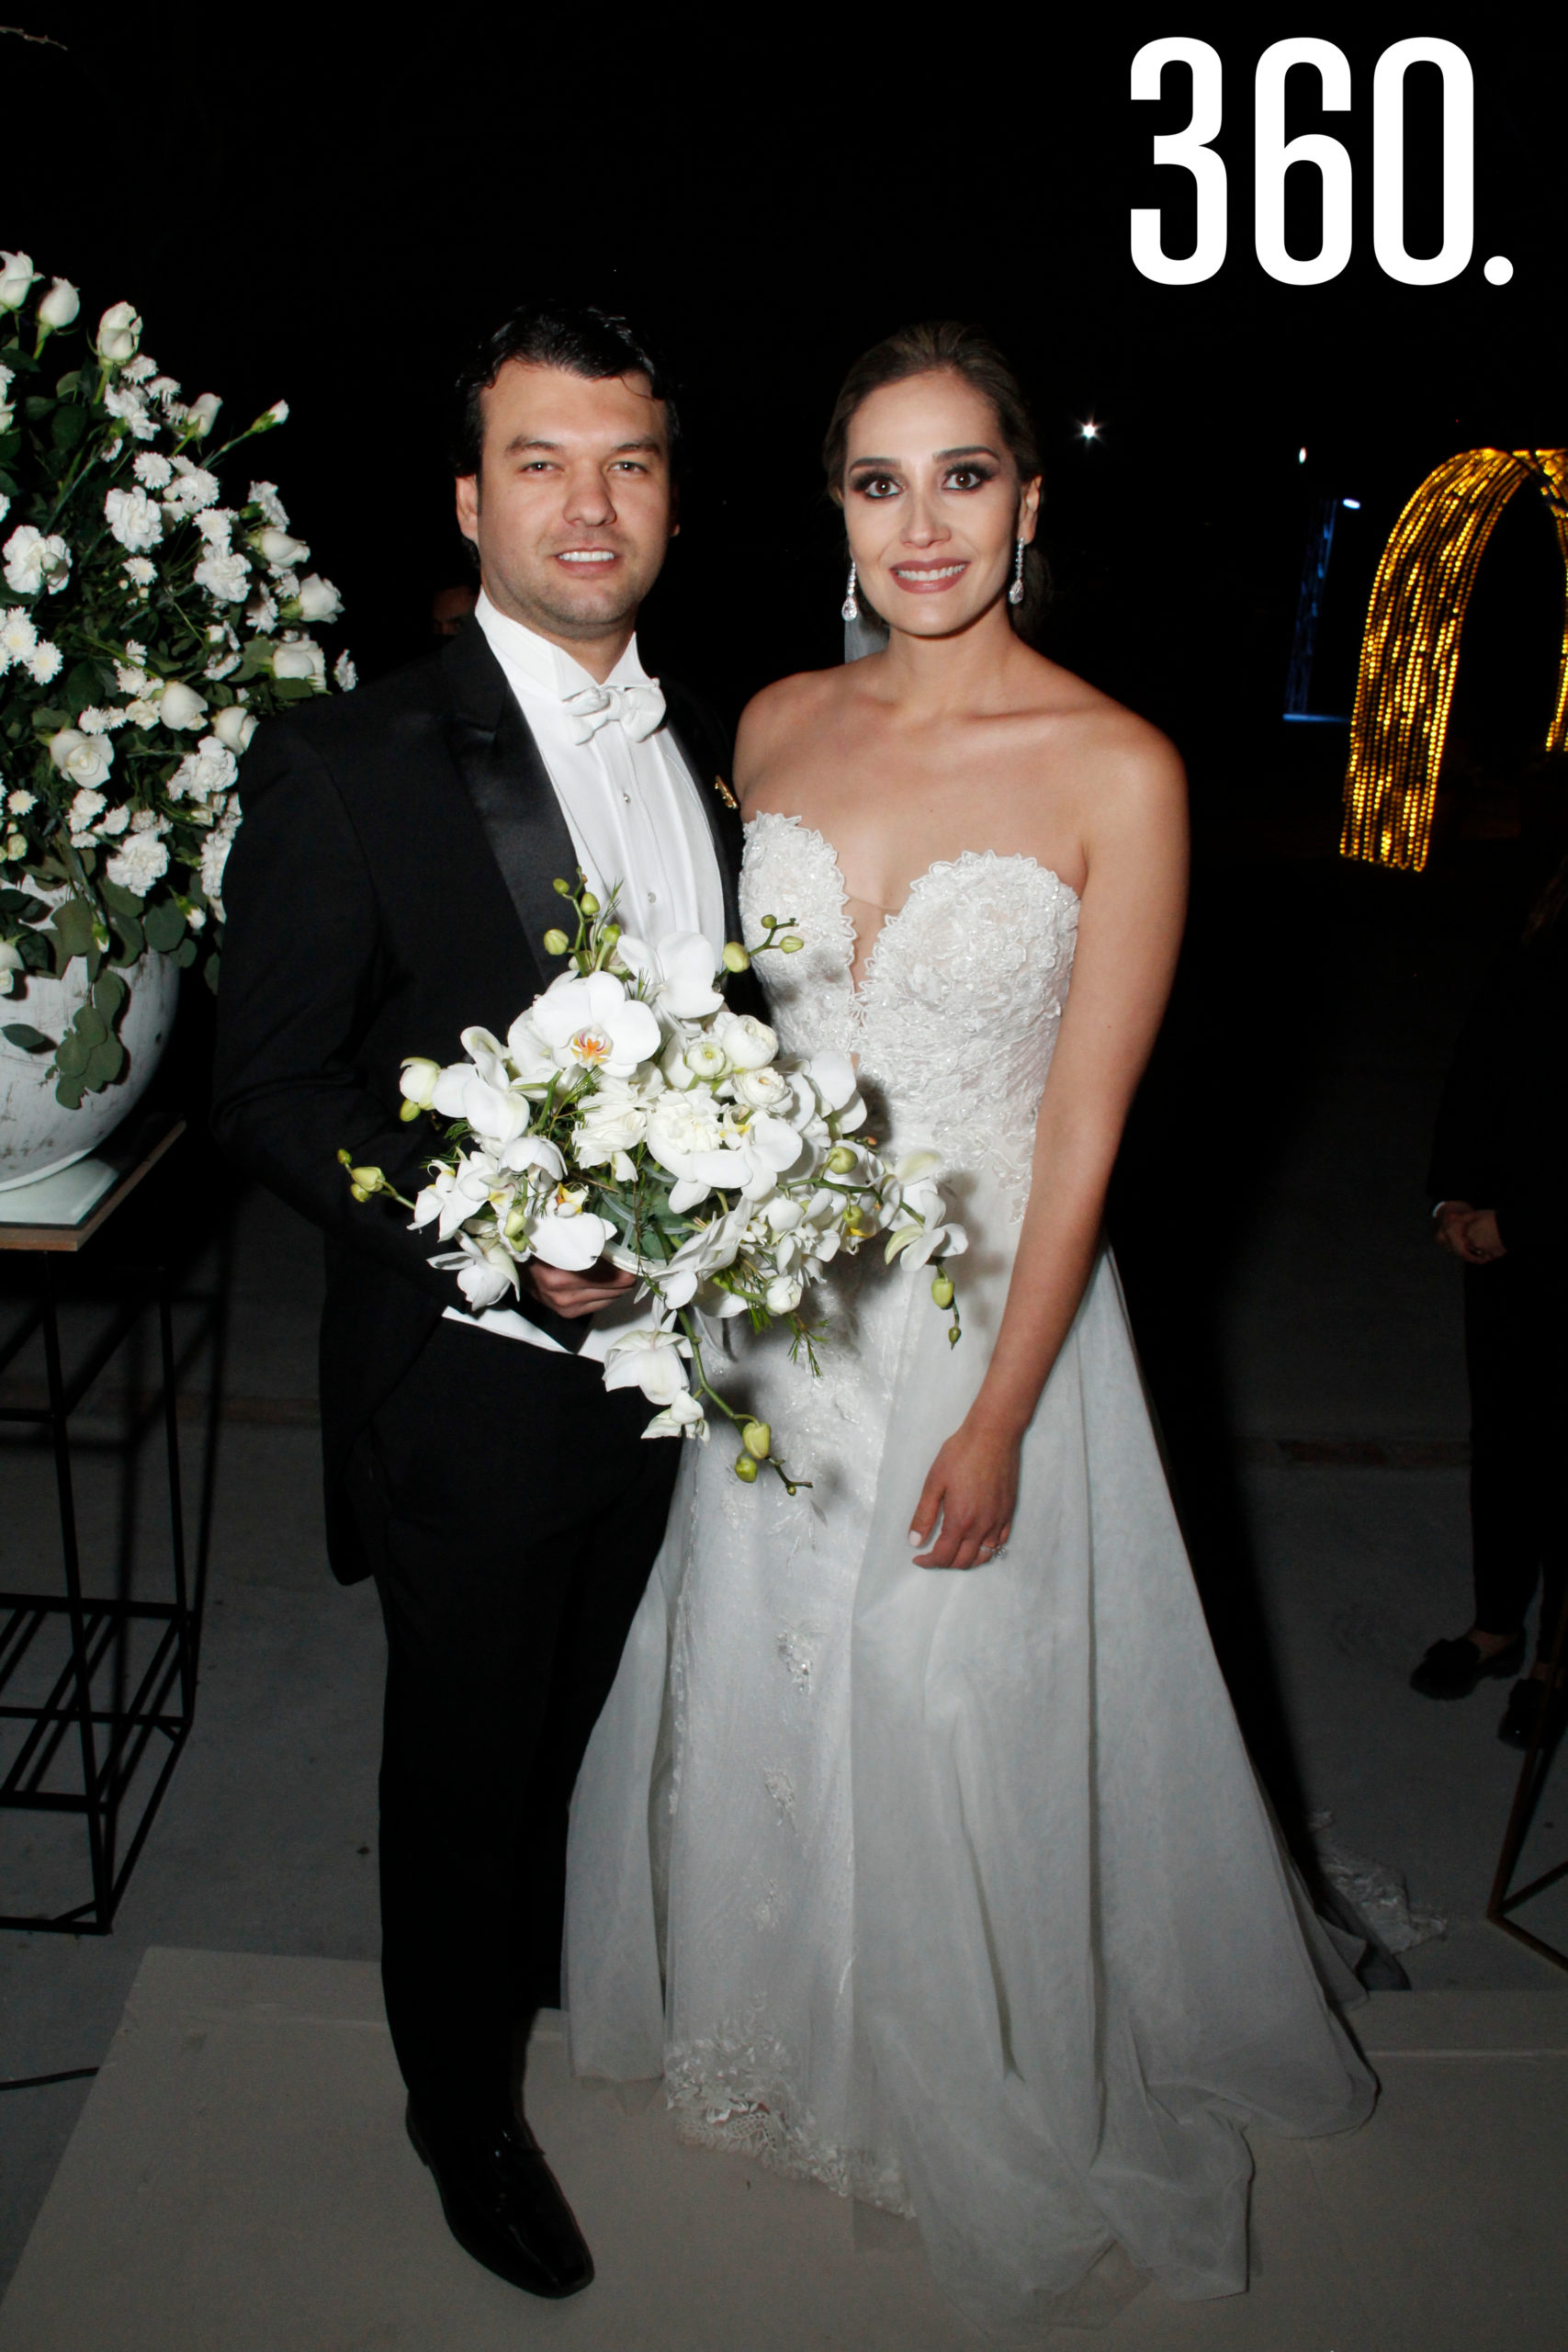 Andrea Hernández de la Mora y Álvaro Arzamendi Álvarez.